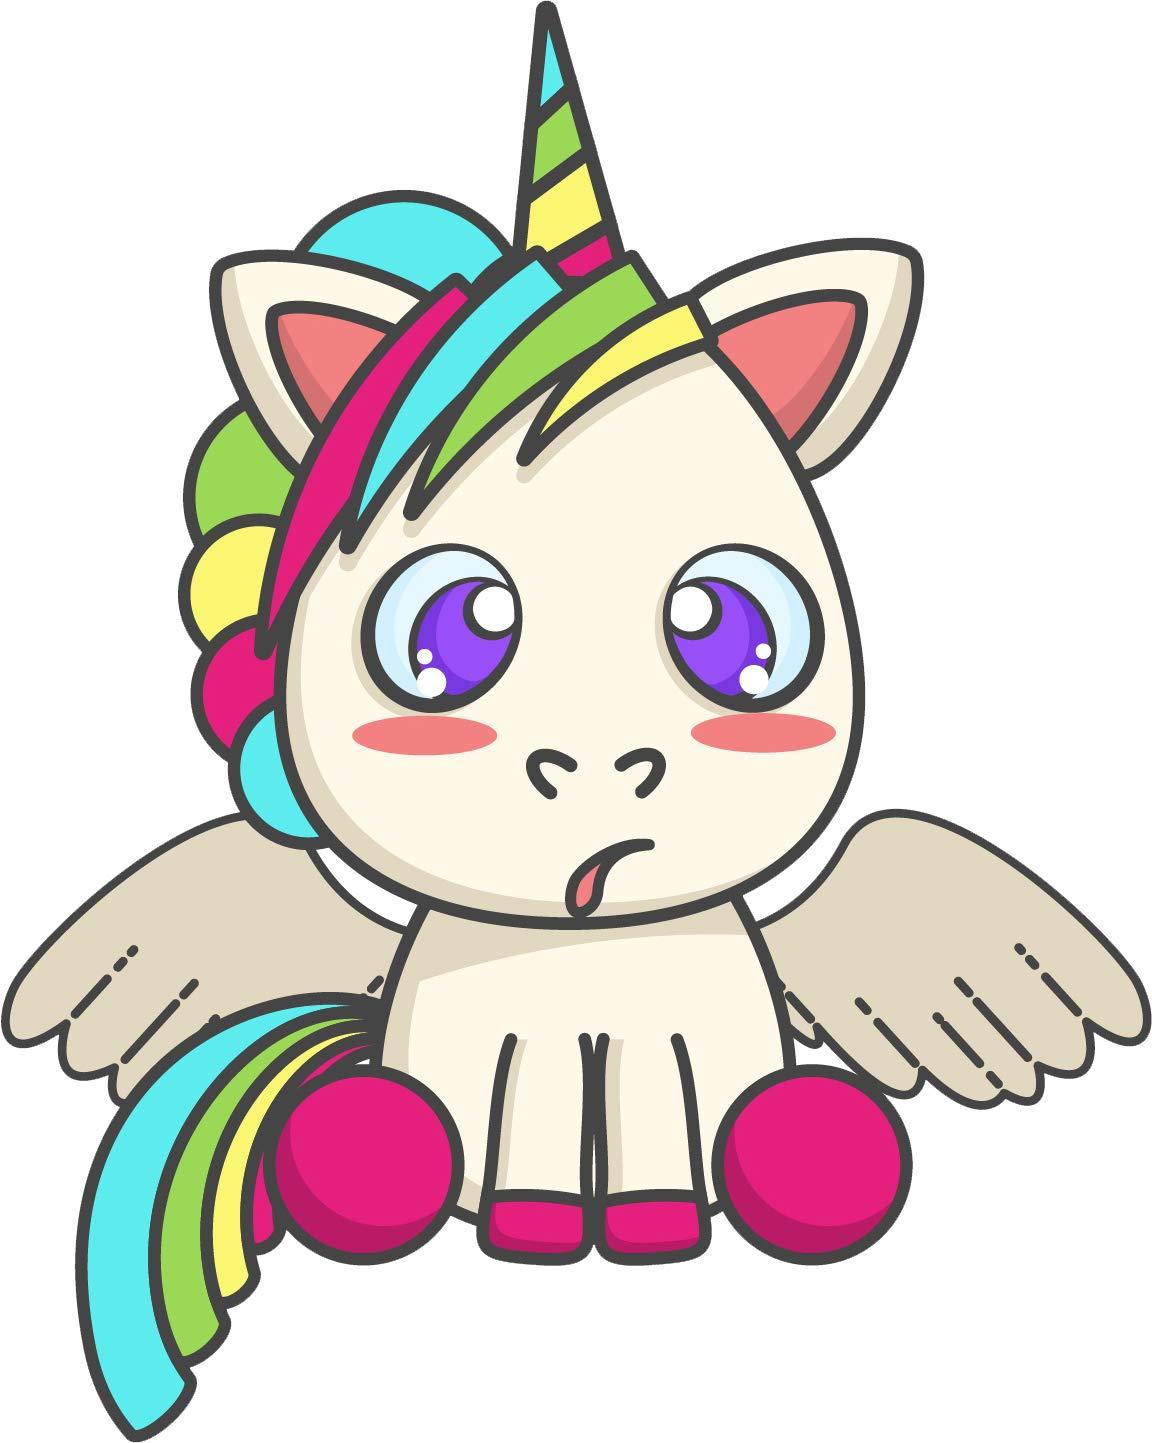 Amazon com cute silly kawaii white rainbow unicorn cartoon emoji vinyl sticker sitting smiling automotive